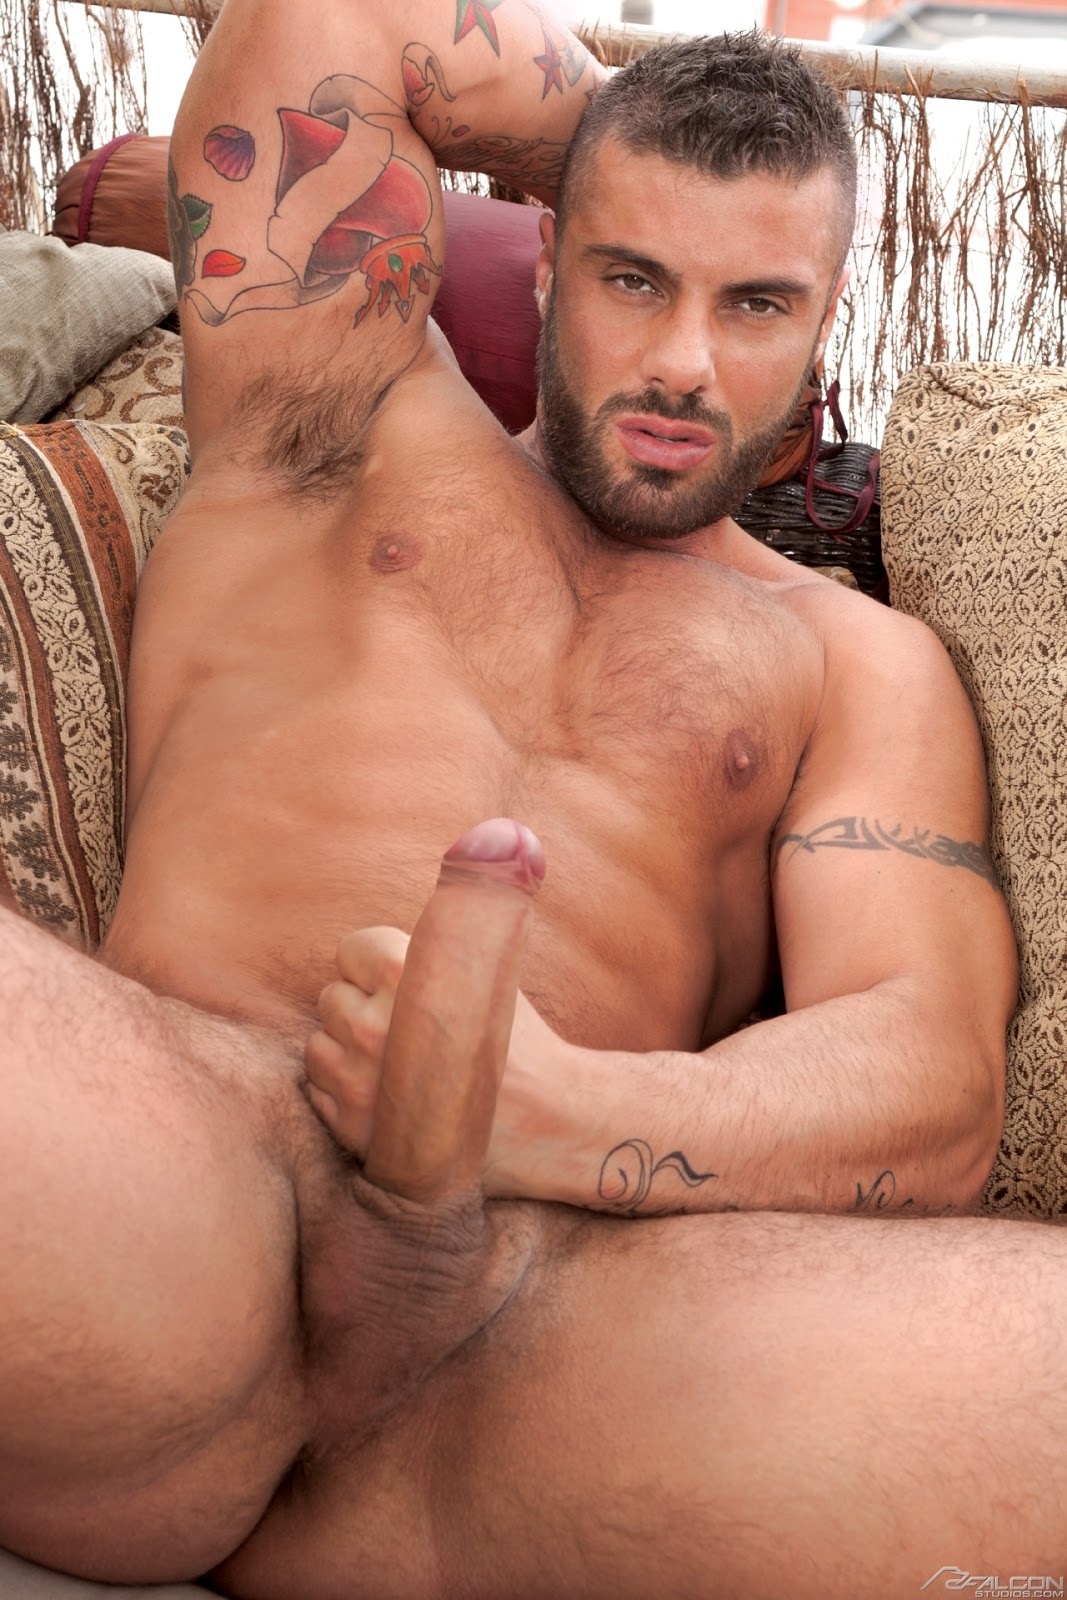 incontri gay versilia ragazzi nudi neri